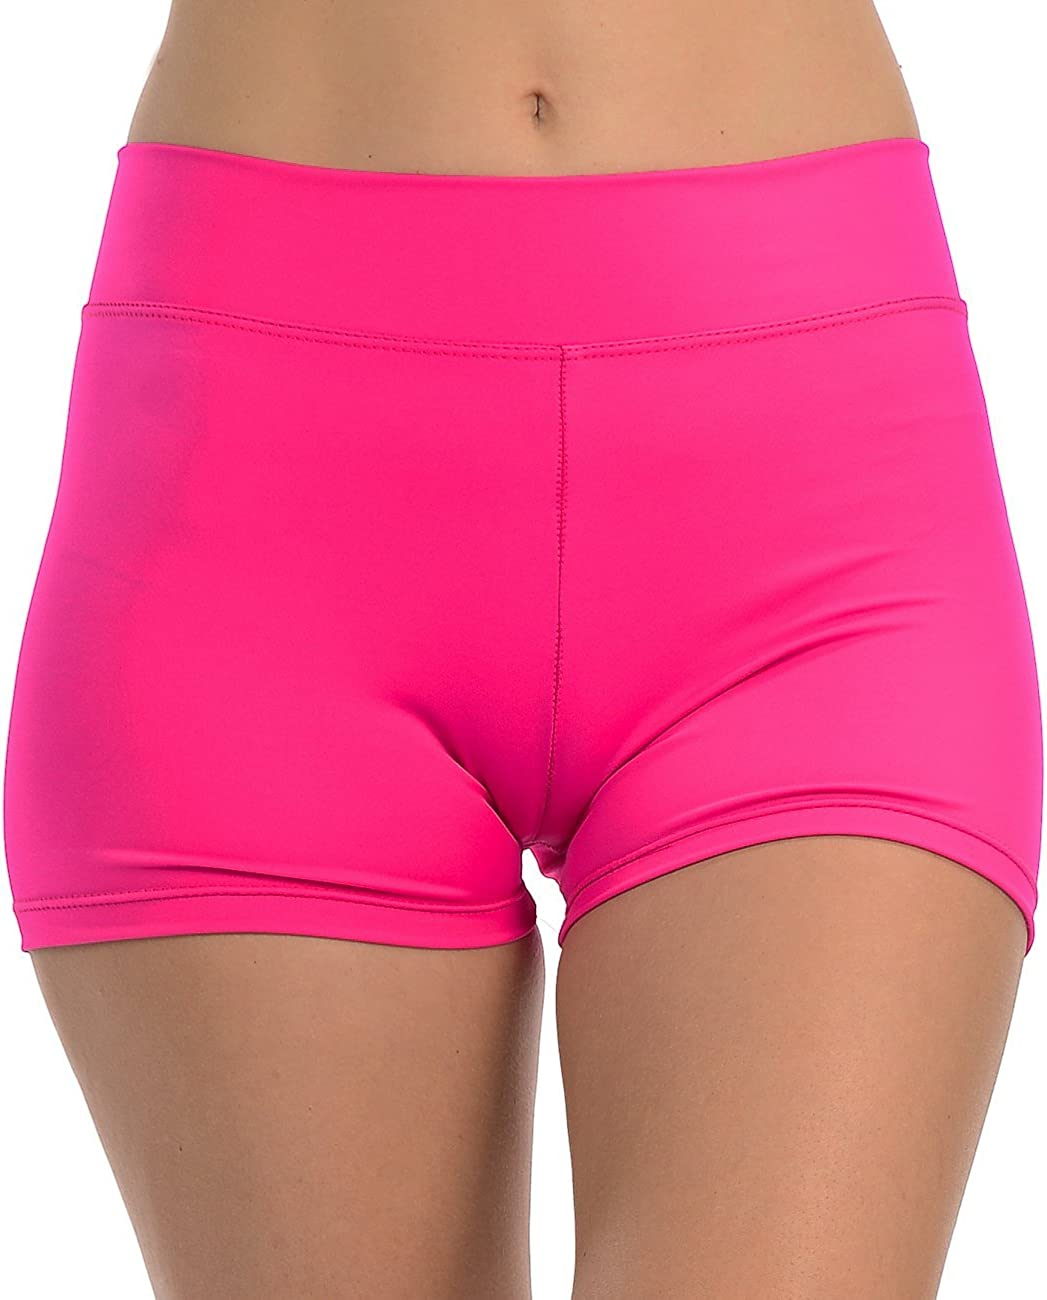 Anza Girls Activewear Dance Booty Shorts Gym Workout Yoga Shorts: Clothing